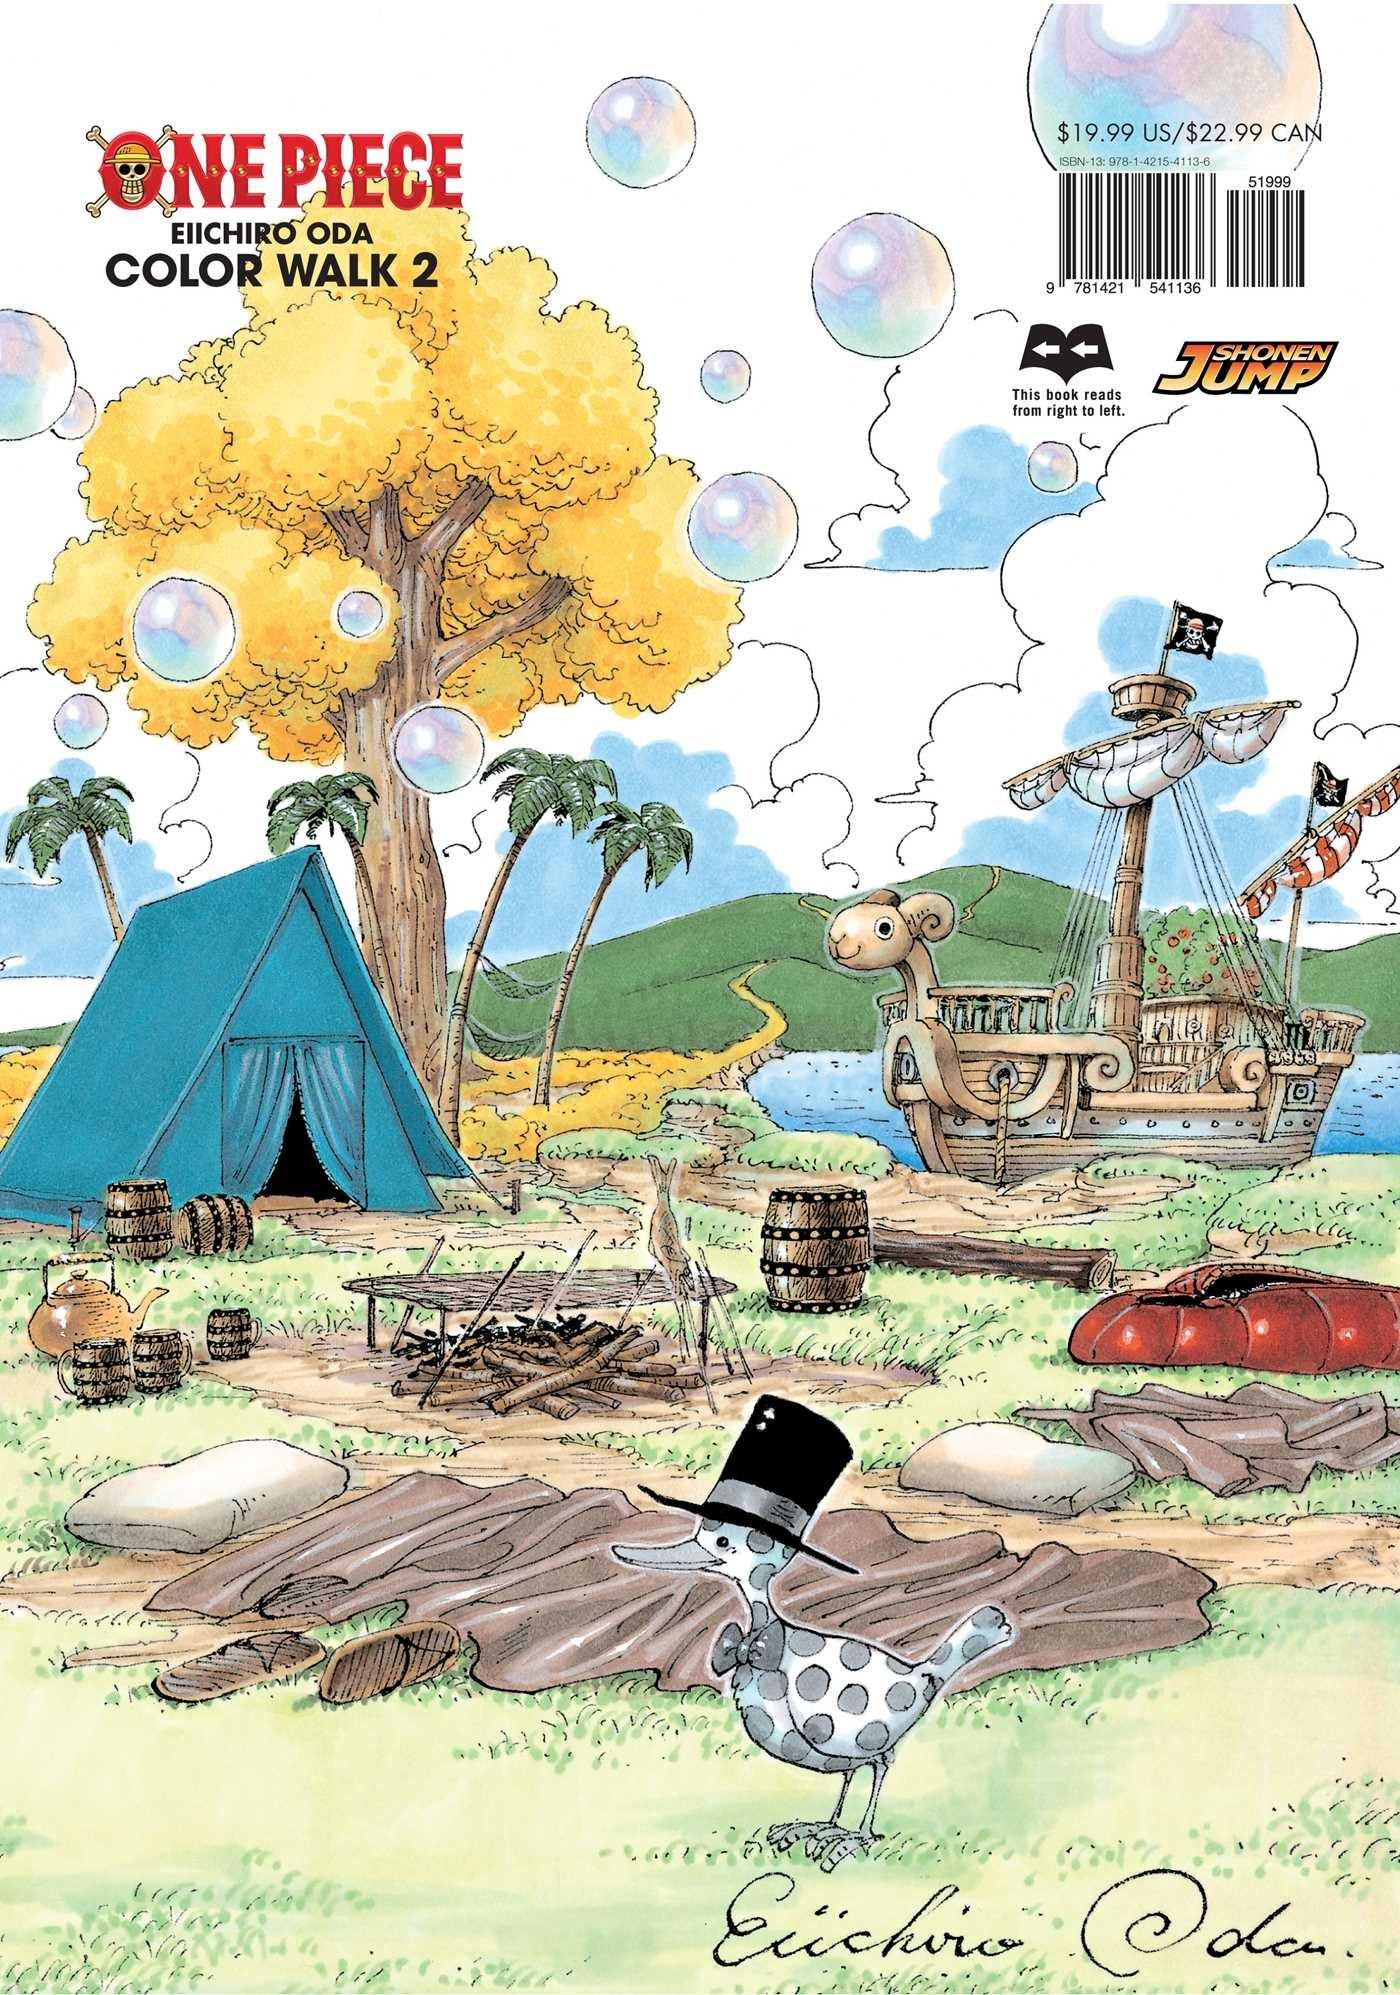 Art color book - One Piece Color Walk Art Book Vol 2 Eiichiro Oda 9781421541136 Amazon Com Books